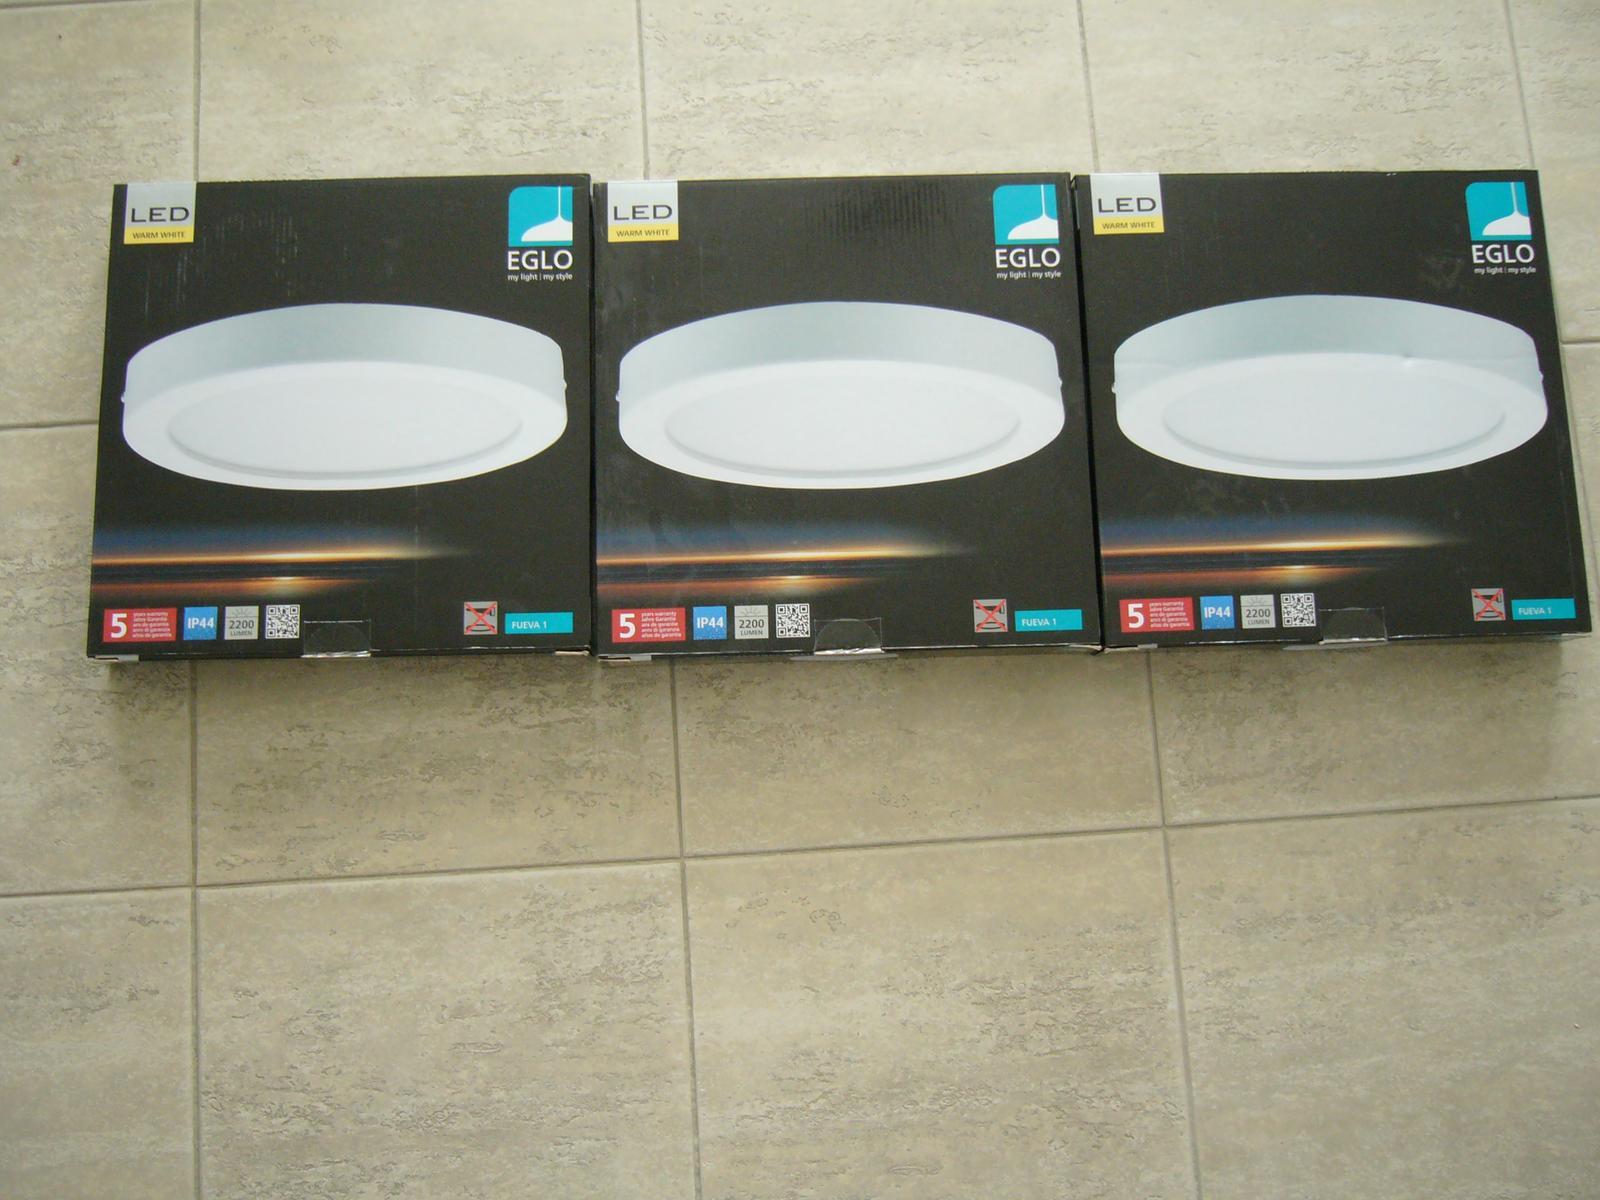 Kúpeľňové svietidlo EGLO FUEVA - Obrázok č. 1